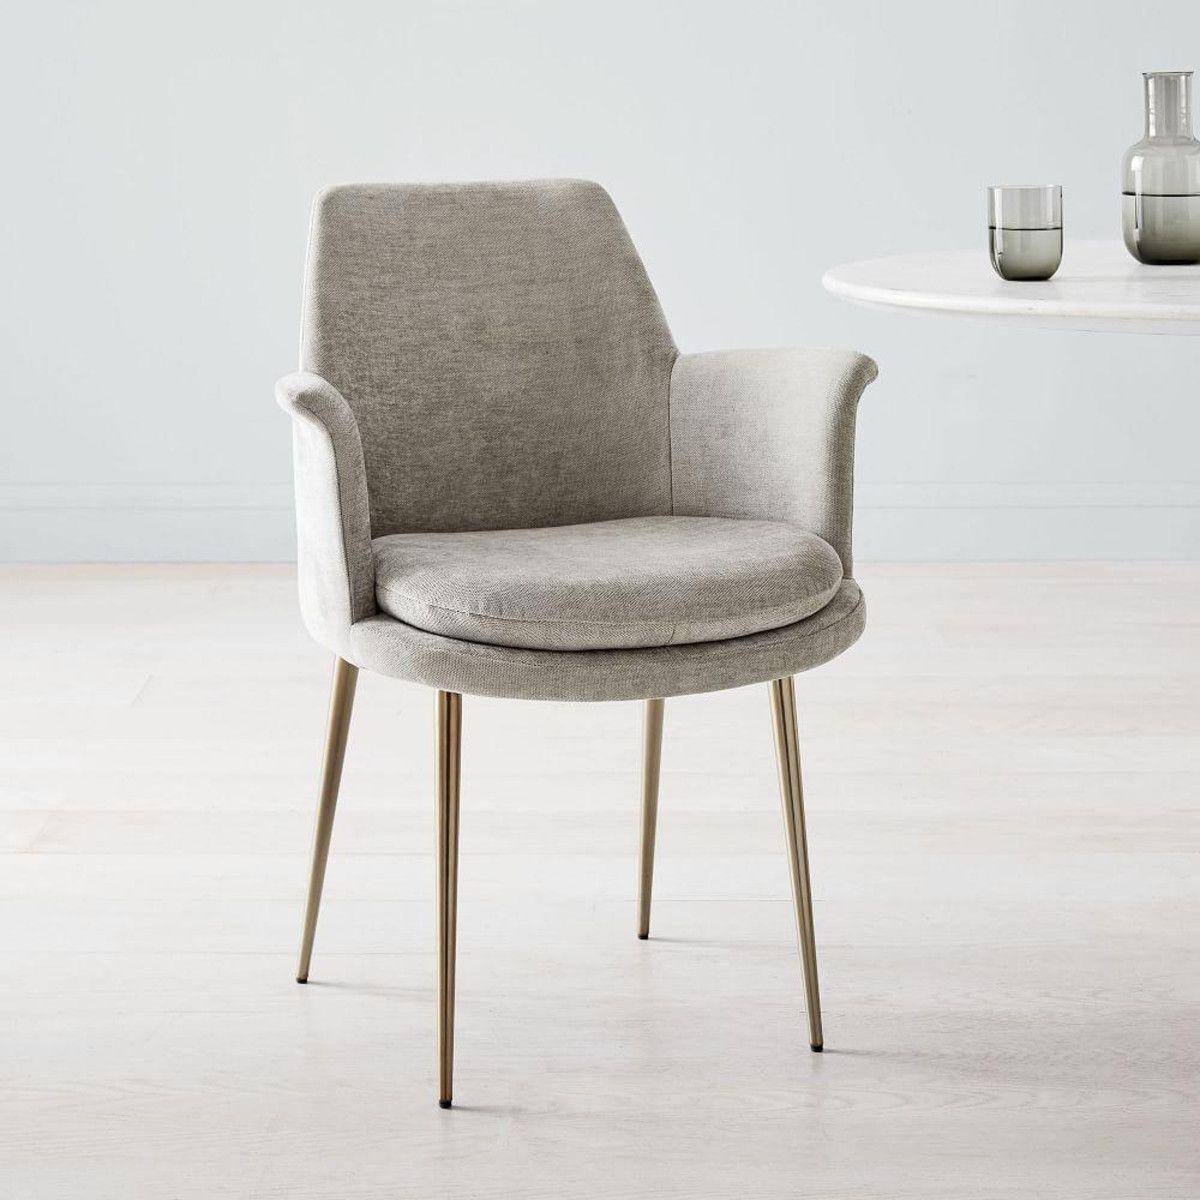 Finley wing velvet dining chair west elm canada